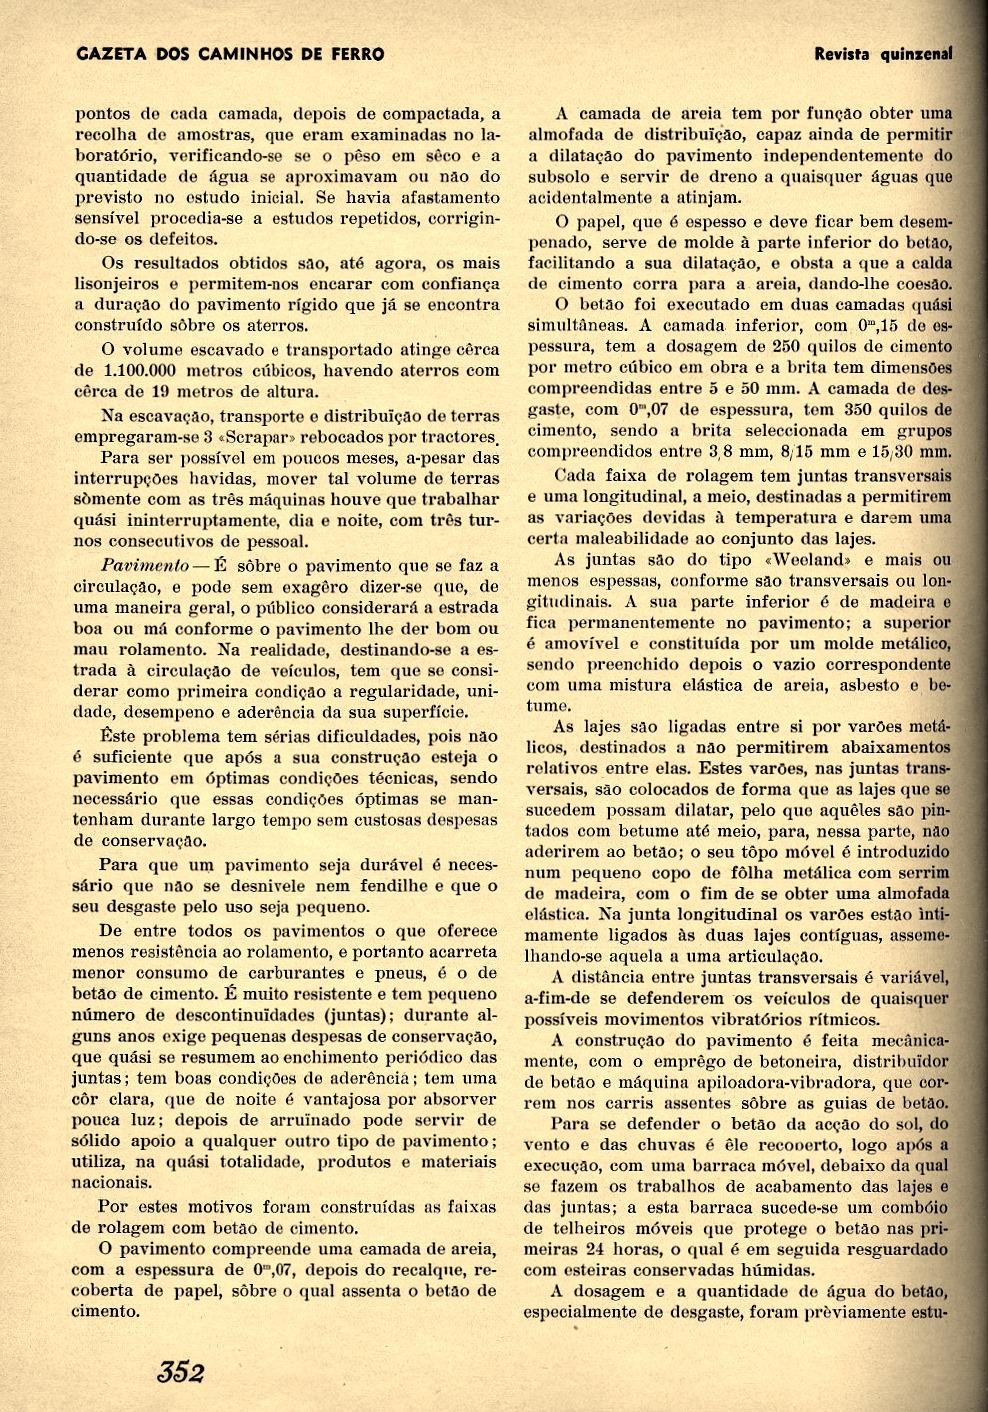 [Gazeta.348]